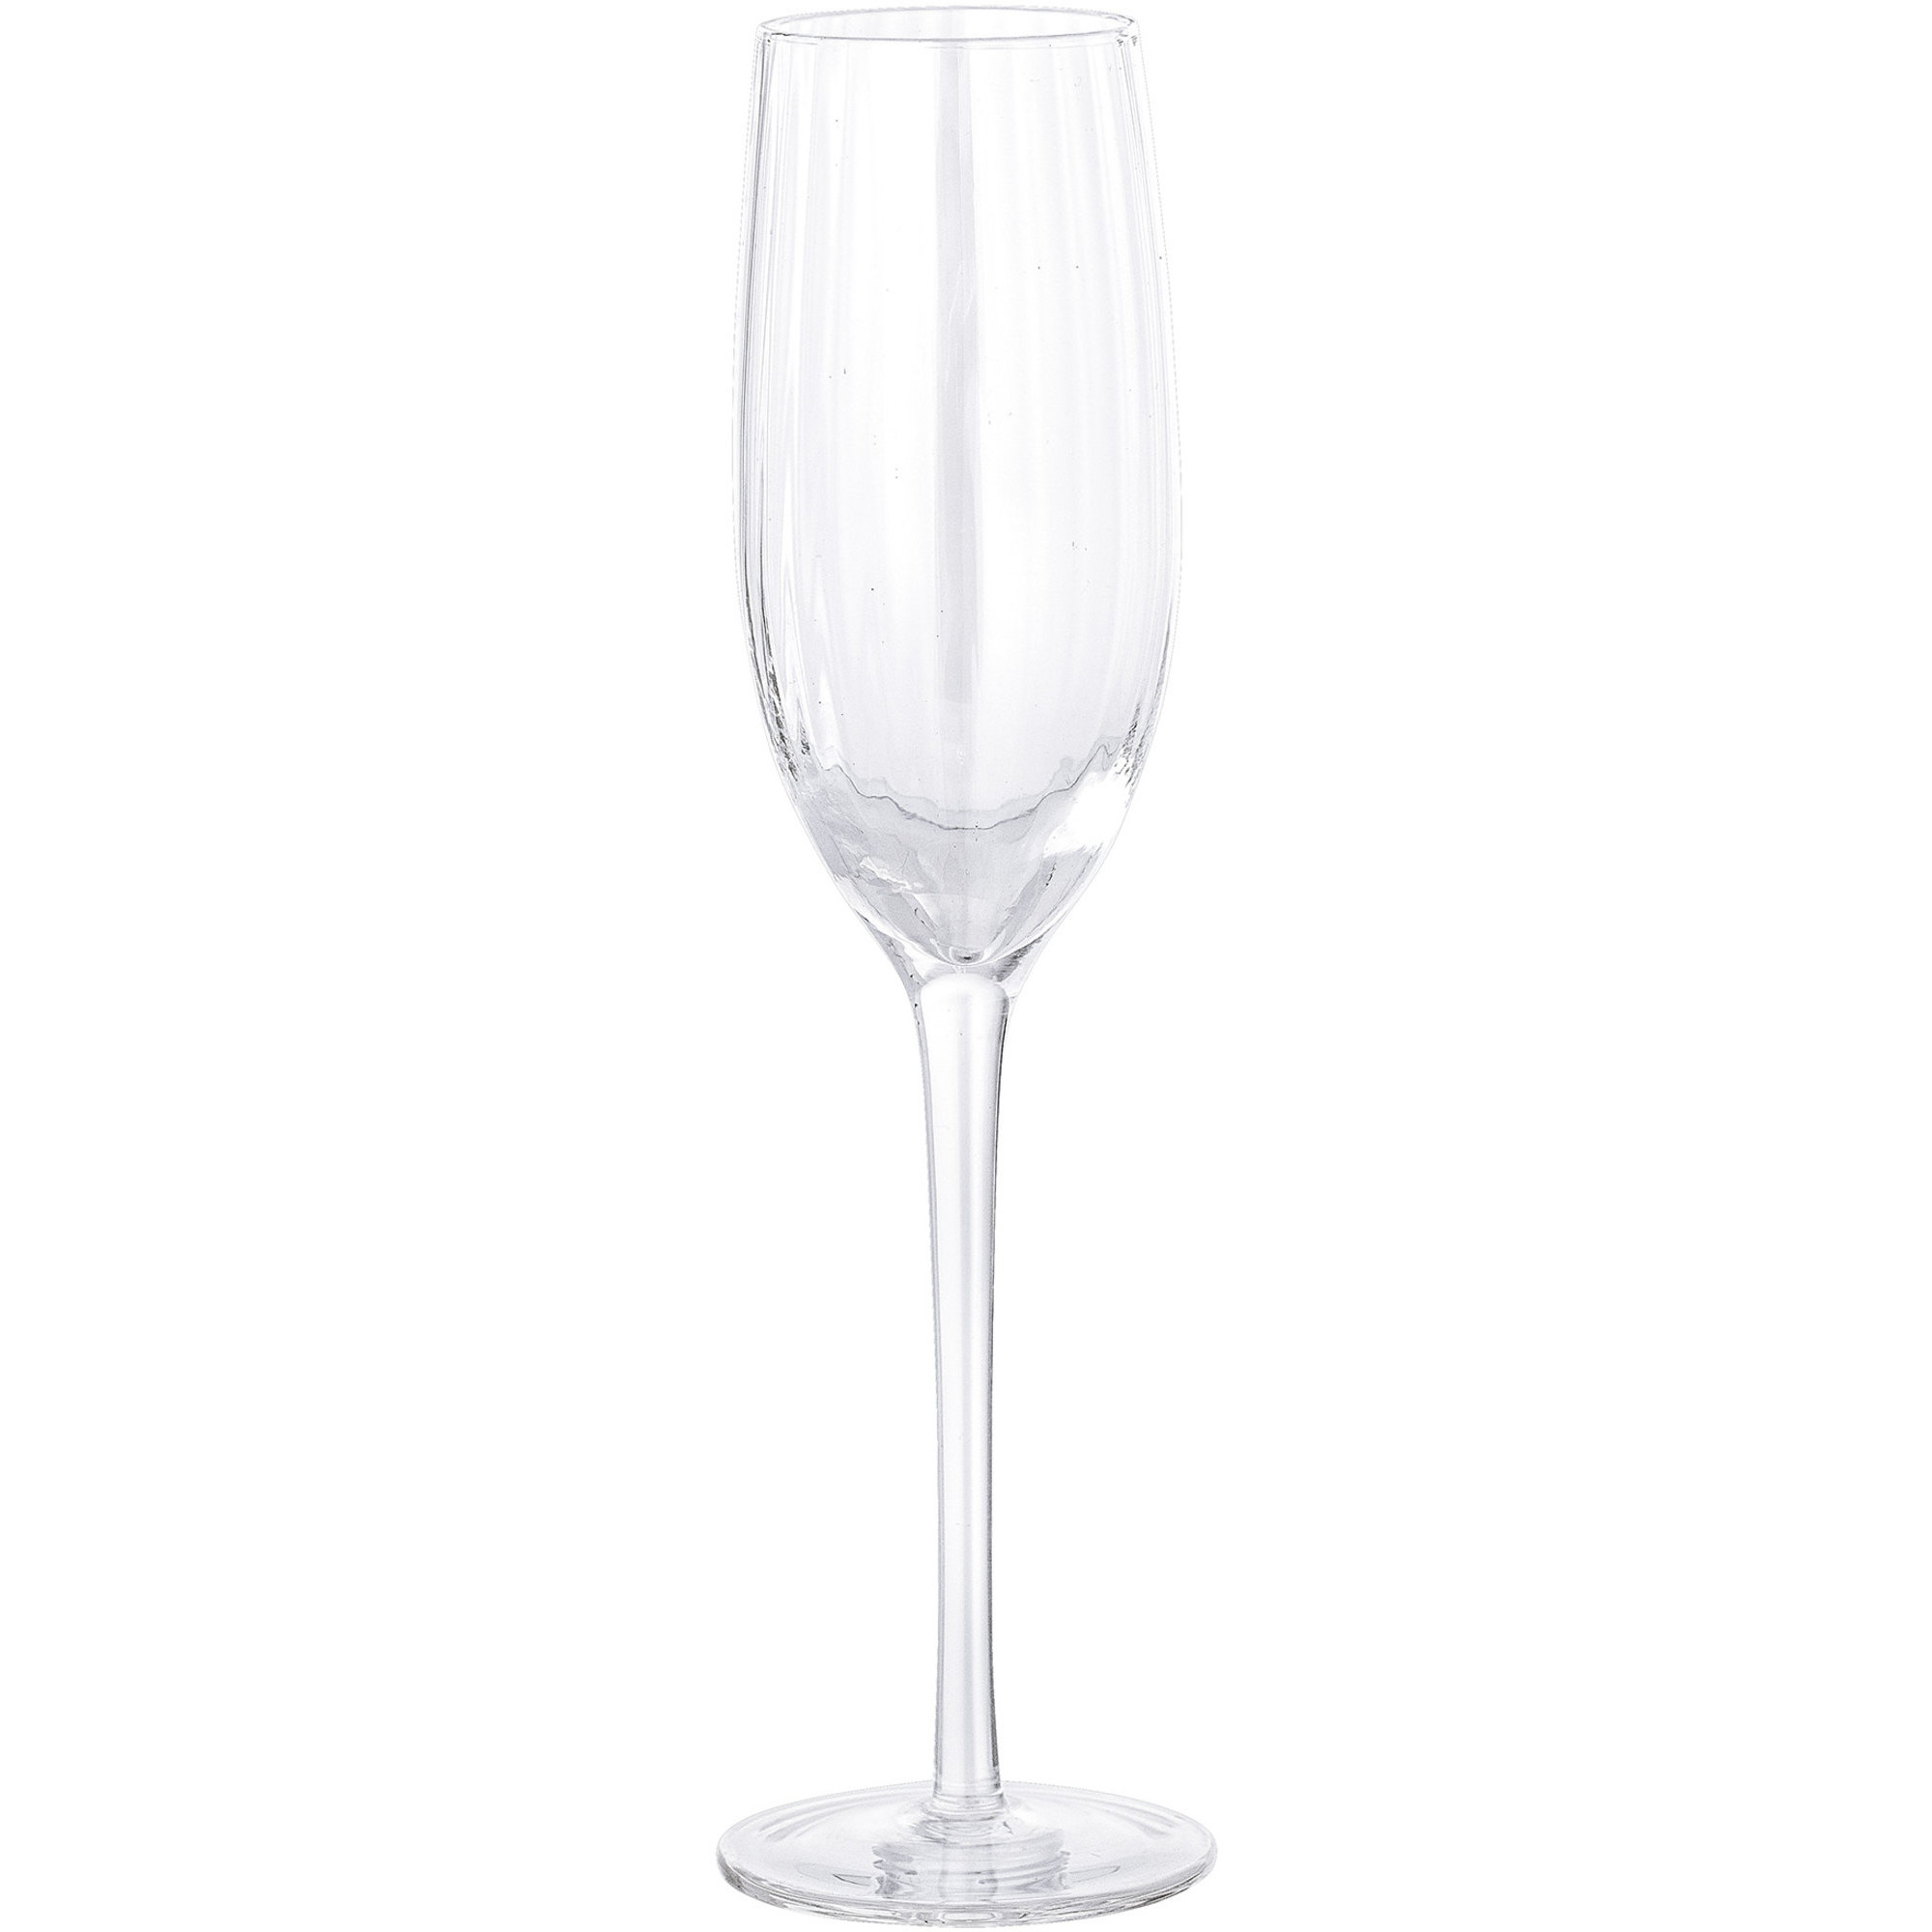 Bloomingville Champagneglas H255 cm.